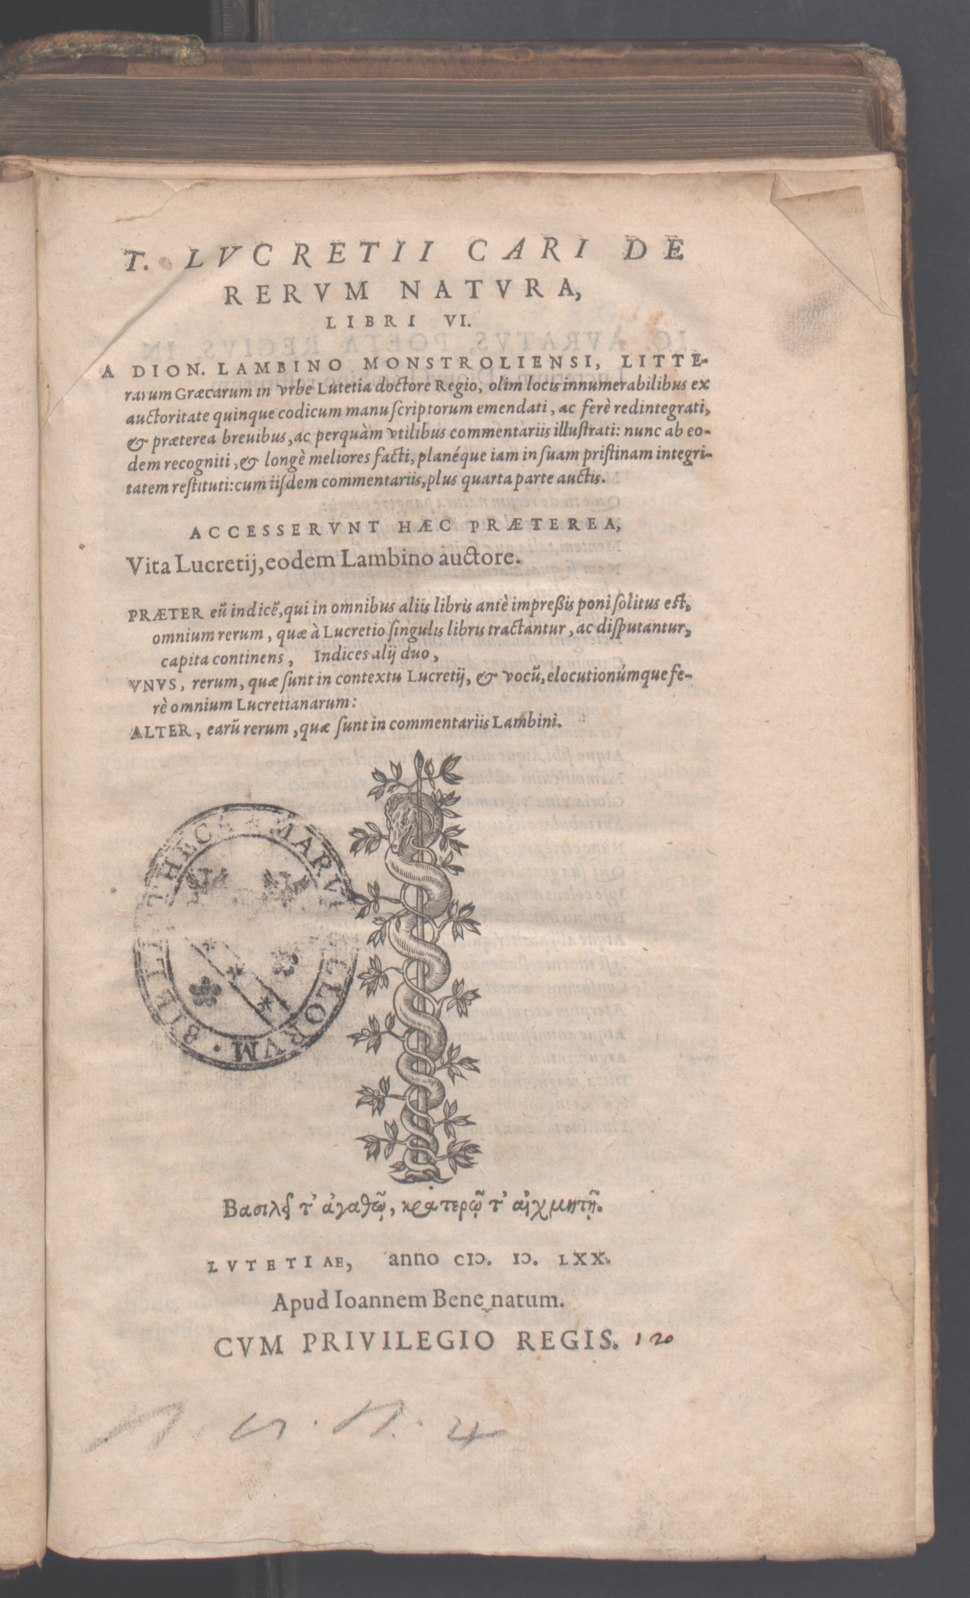 T. Lucretii Cari De rerum natura